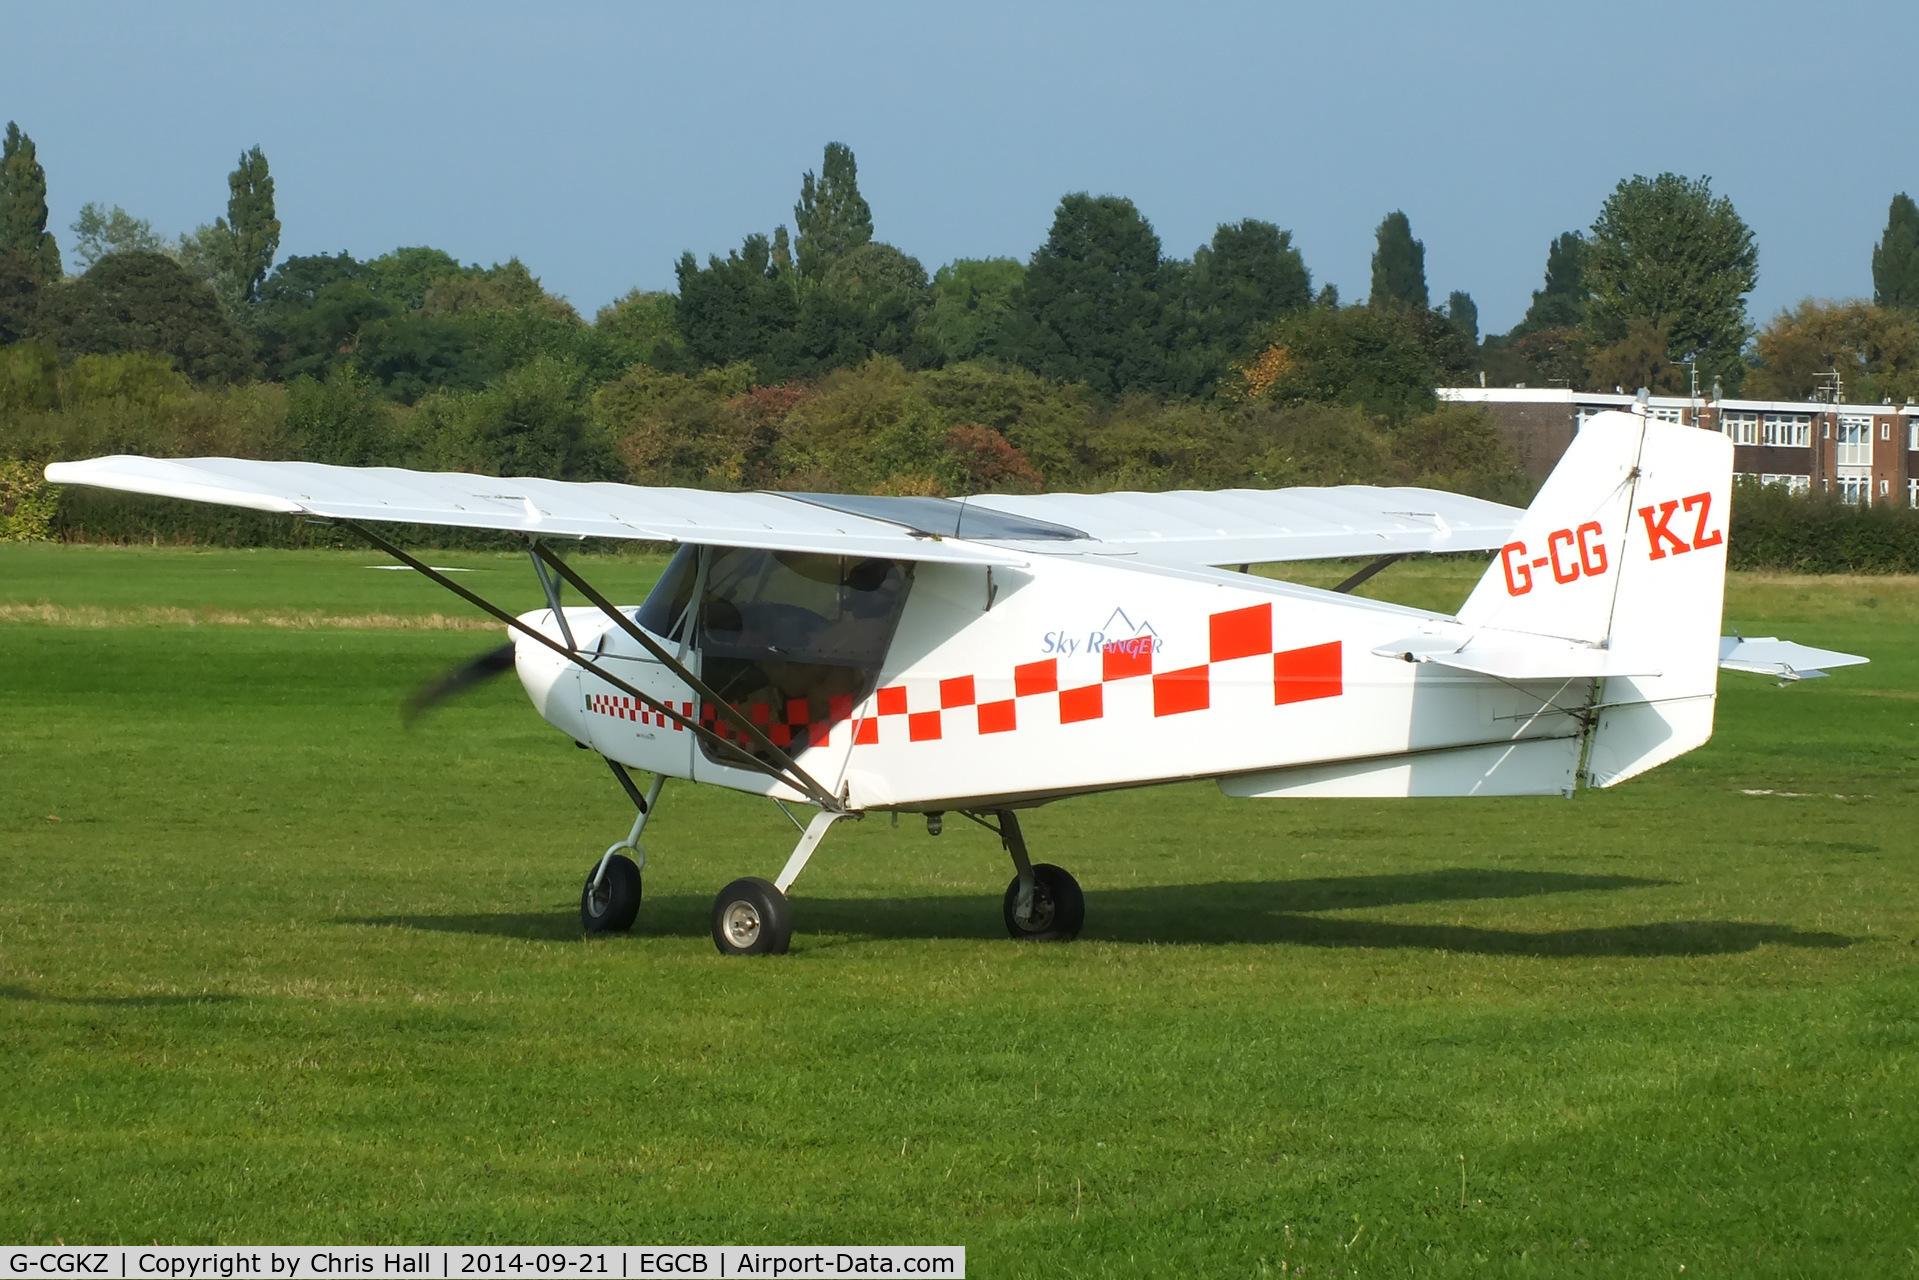 G-CGKZ, 2010 Best Off Skyranger Swift 912S(1) C/N BMAA/HB/596, visitor at Barton